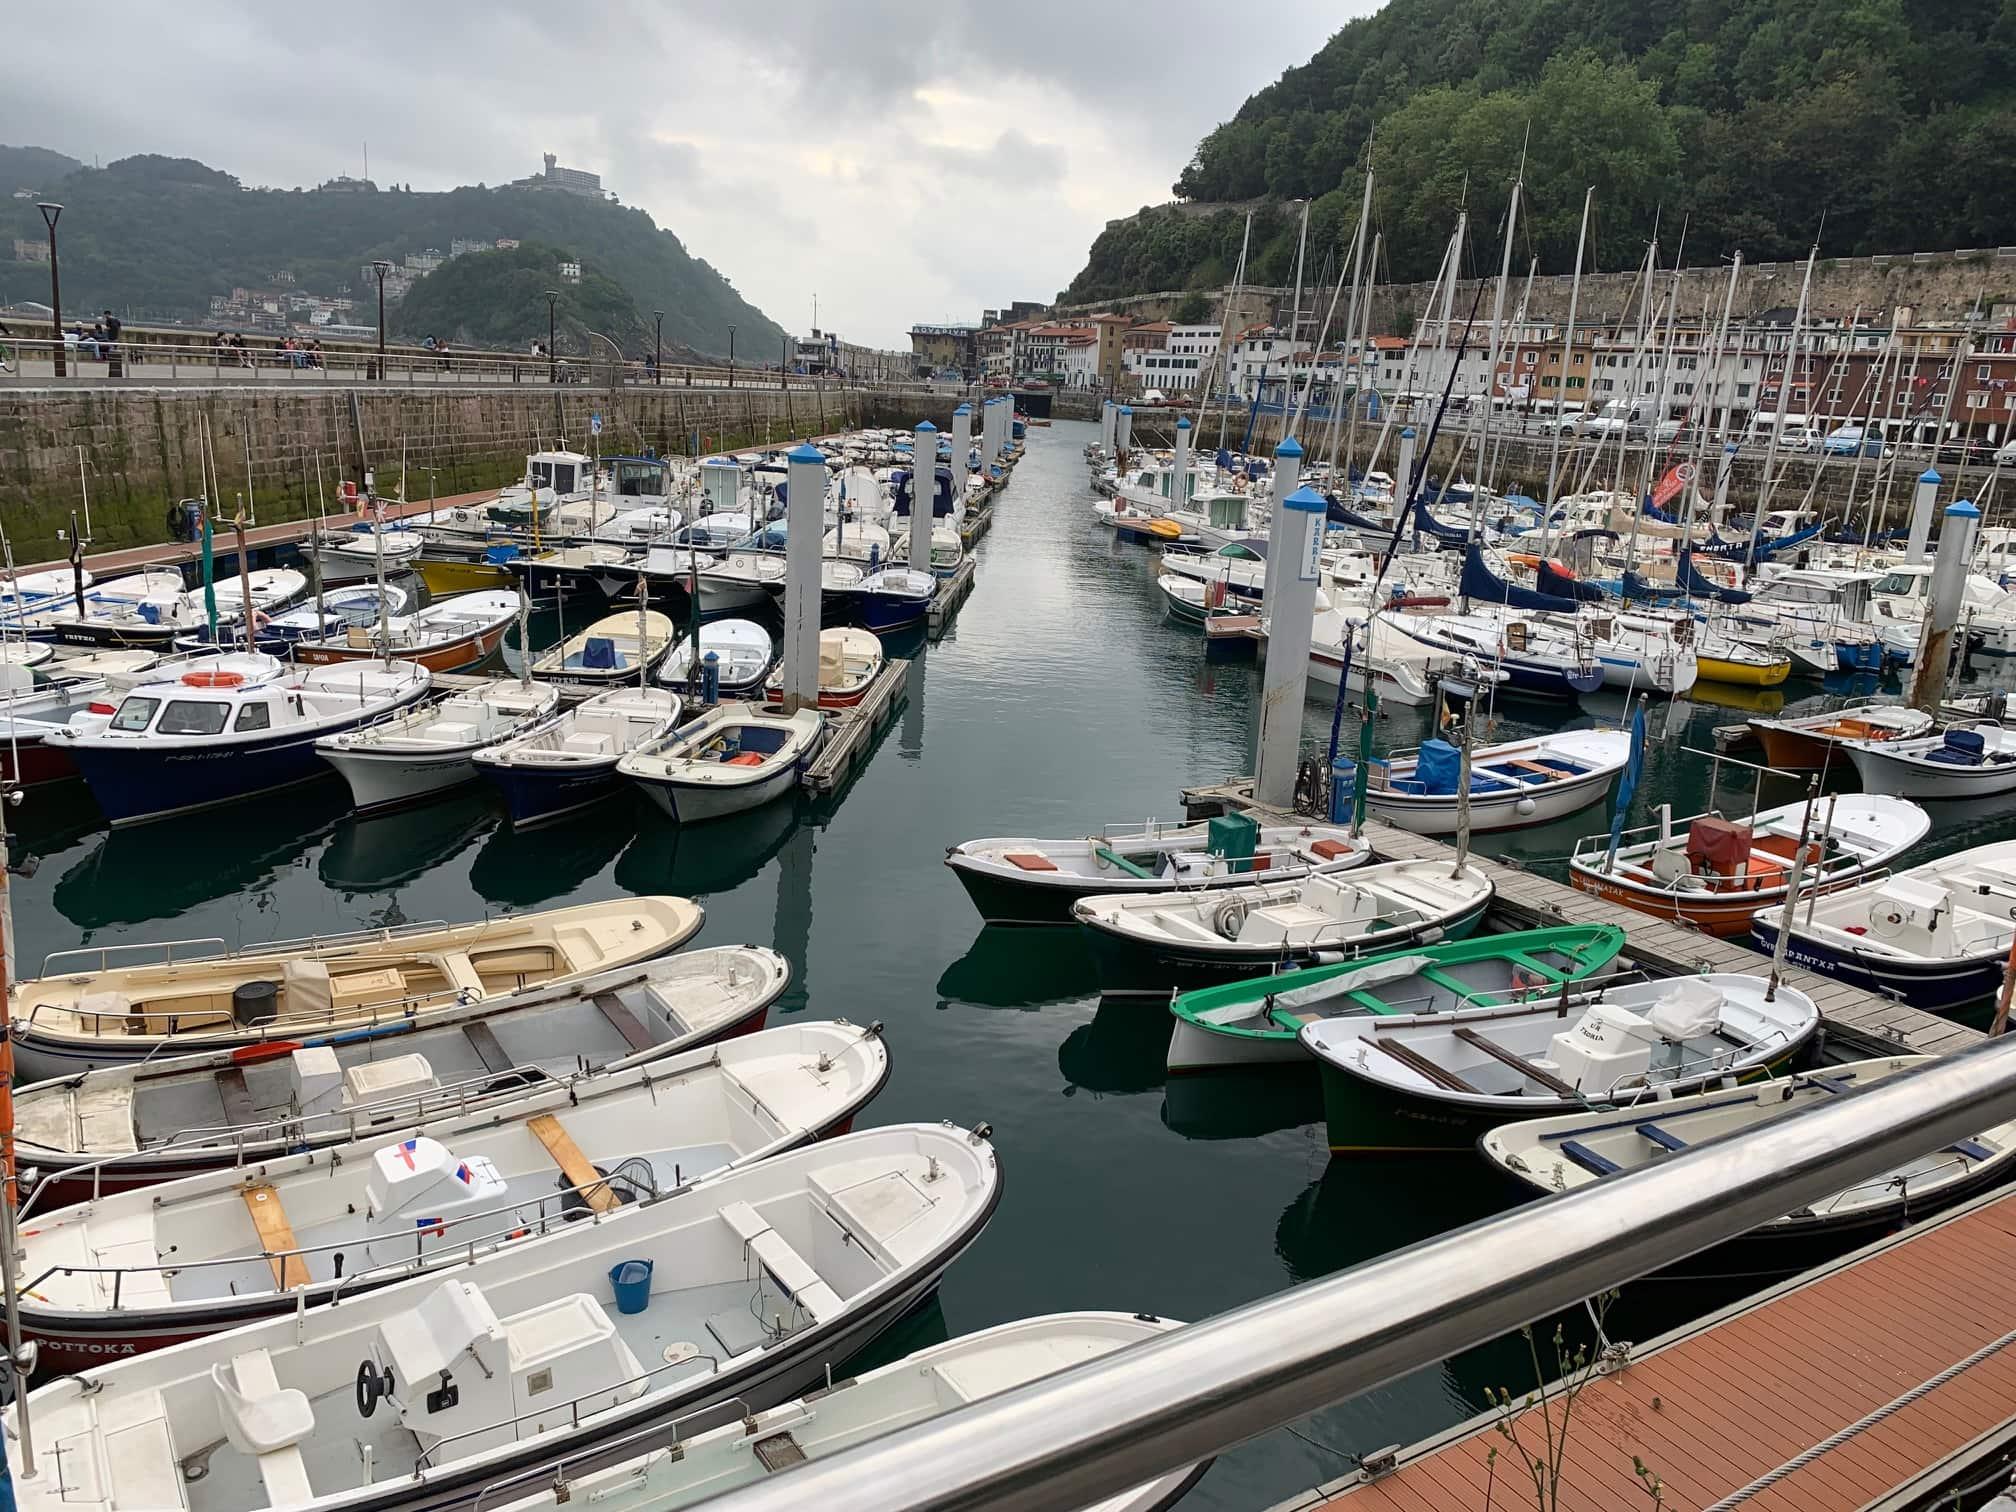 San Sebastian docked boats